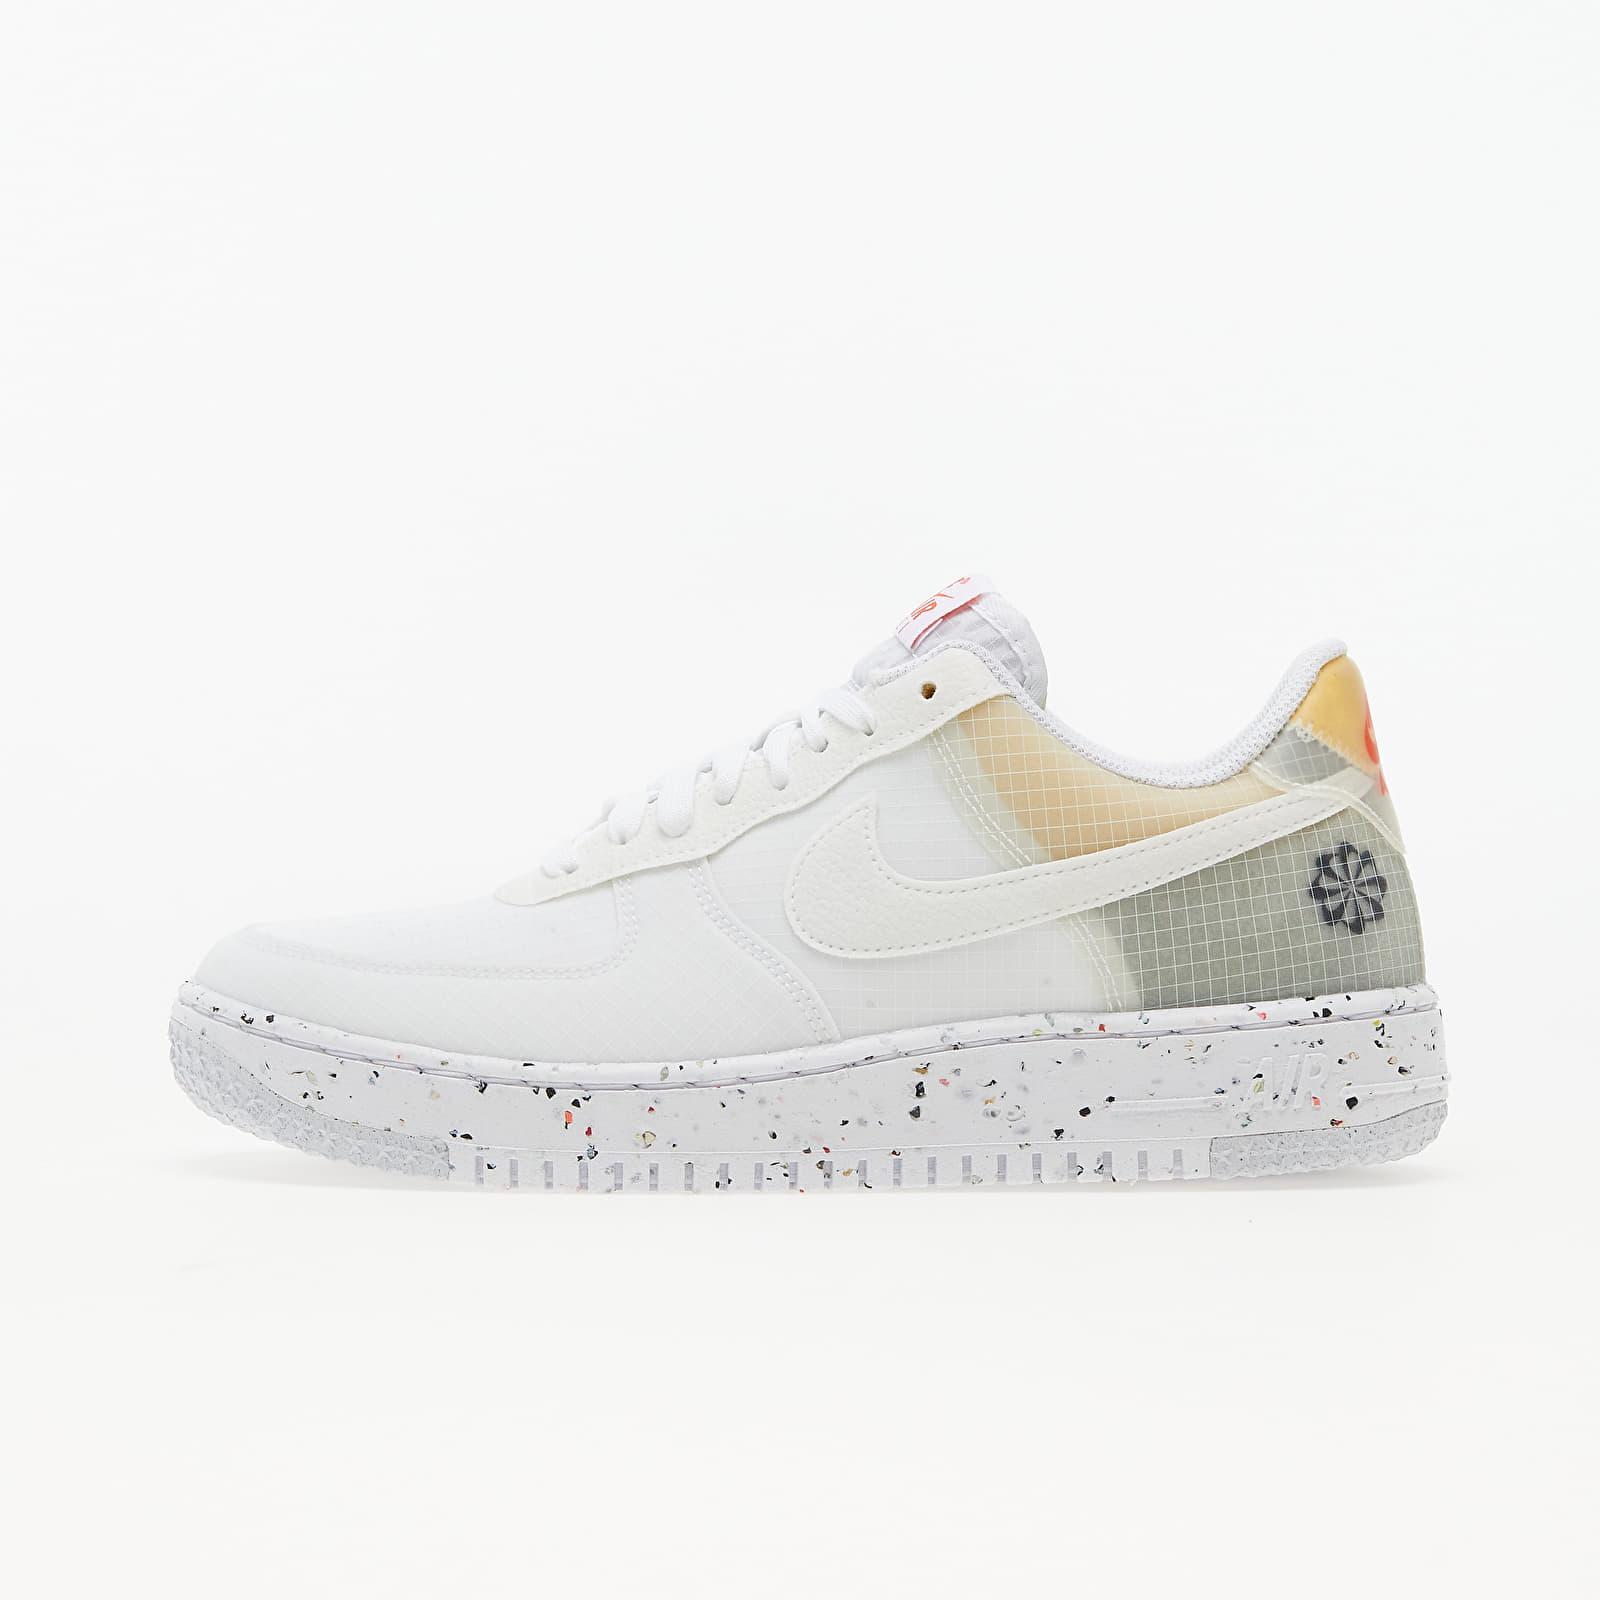 Nike Air Force 1 Crater White/ White-Orange EUR 43